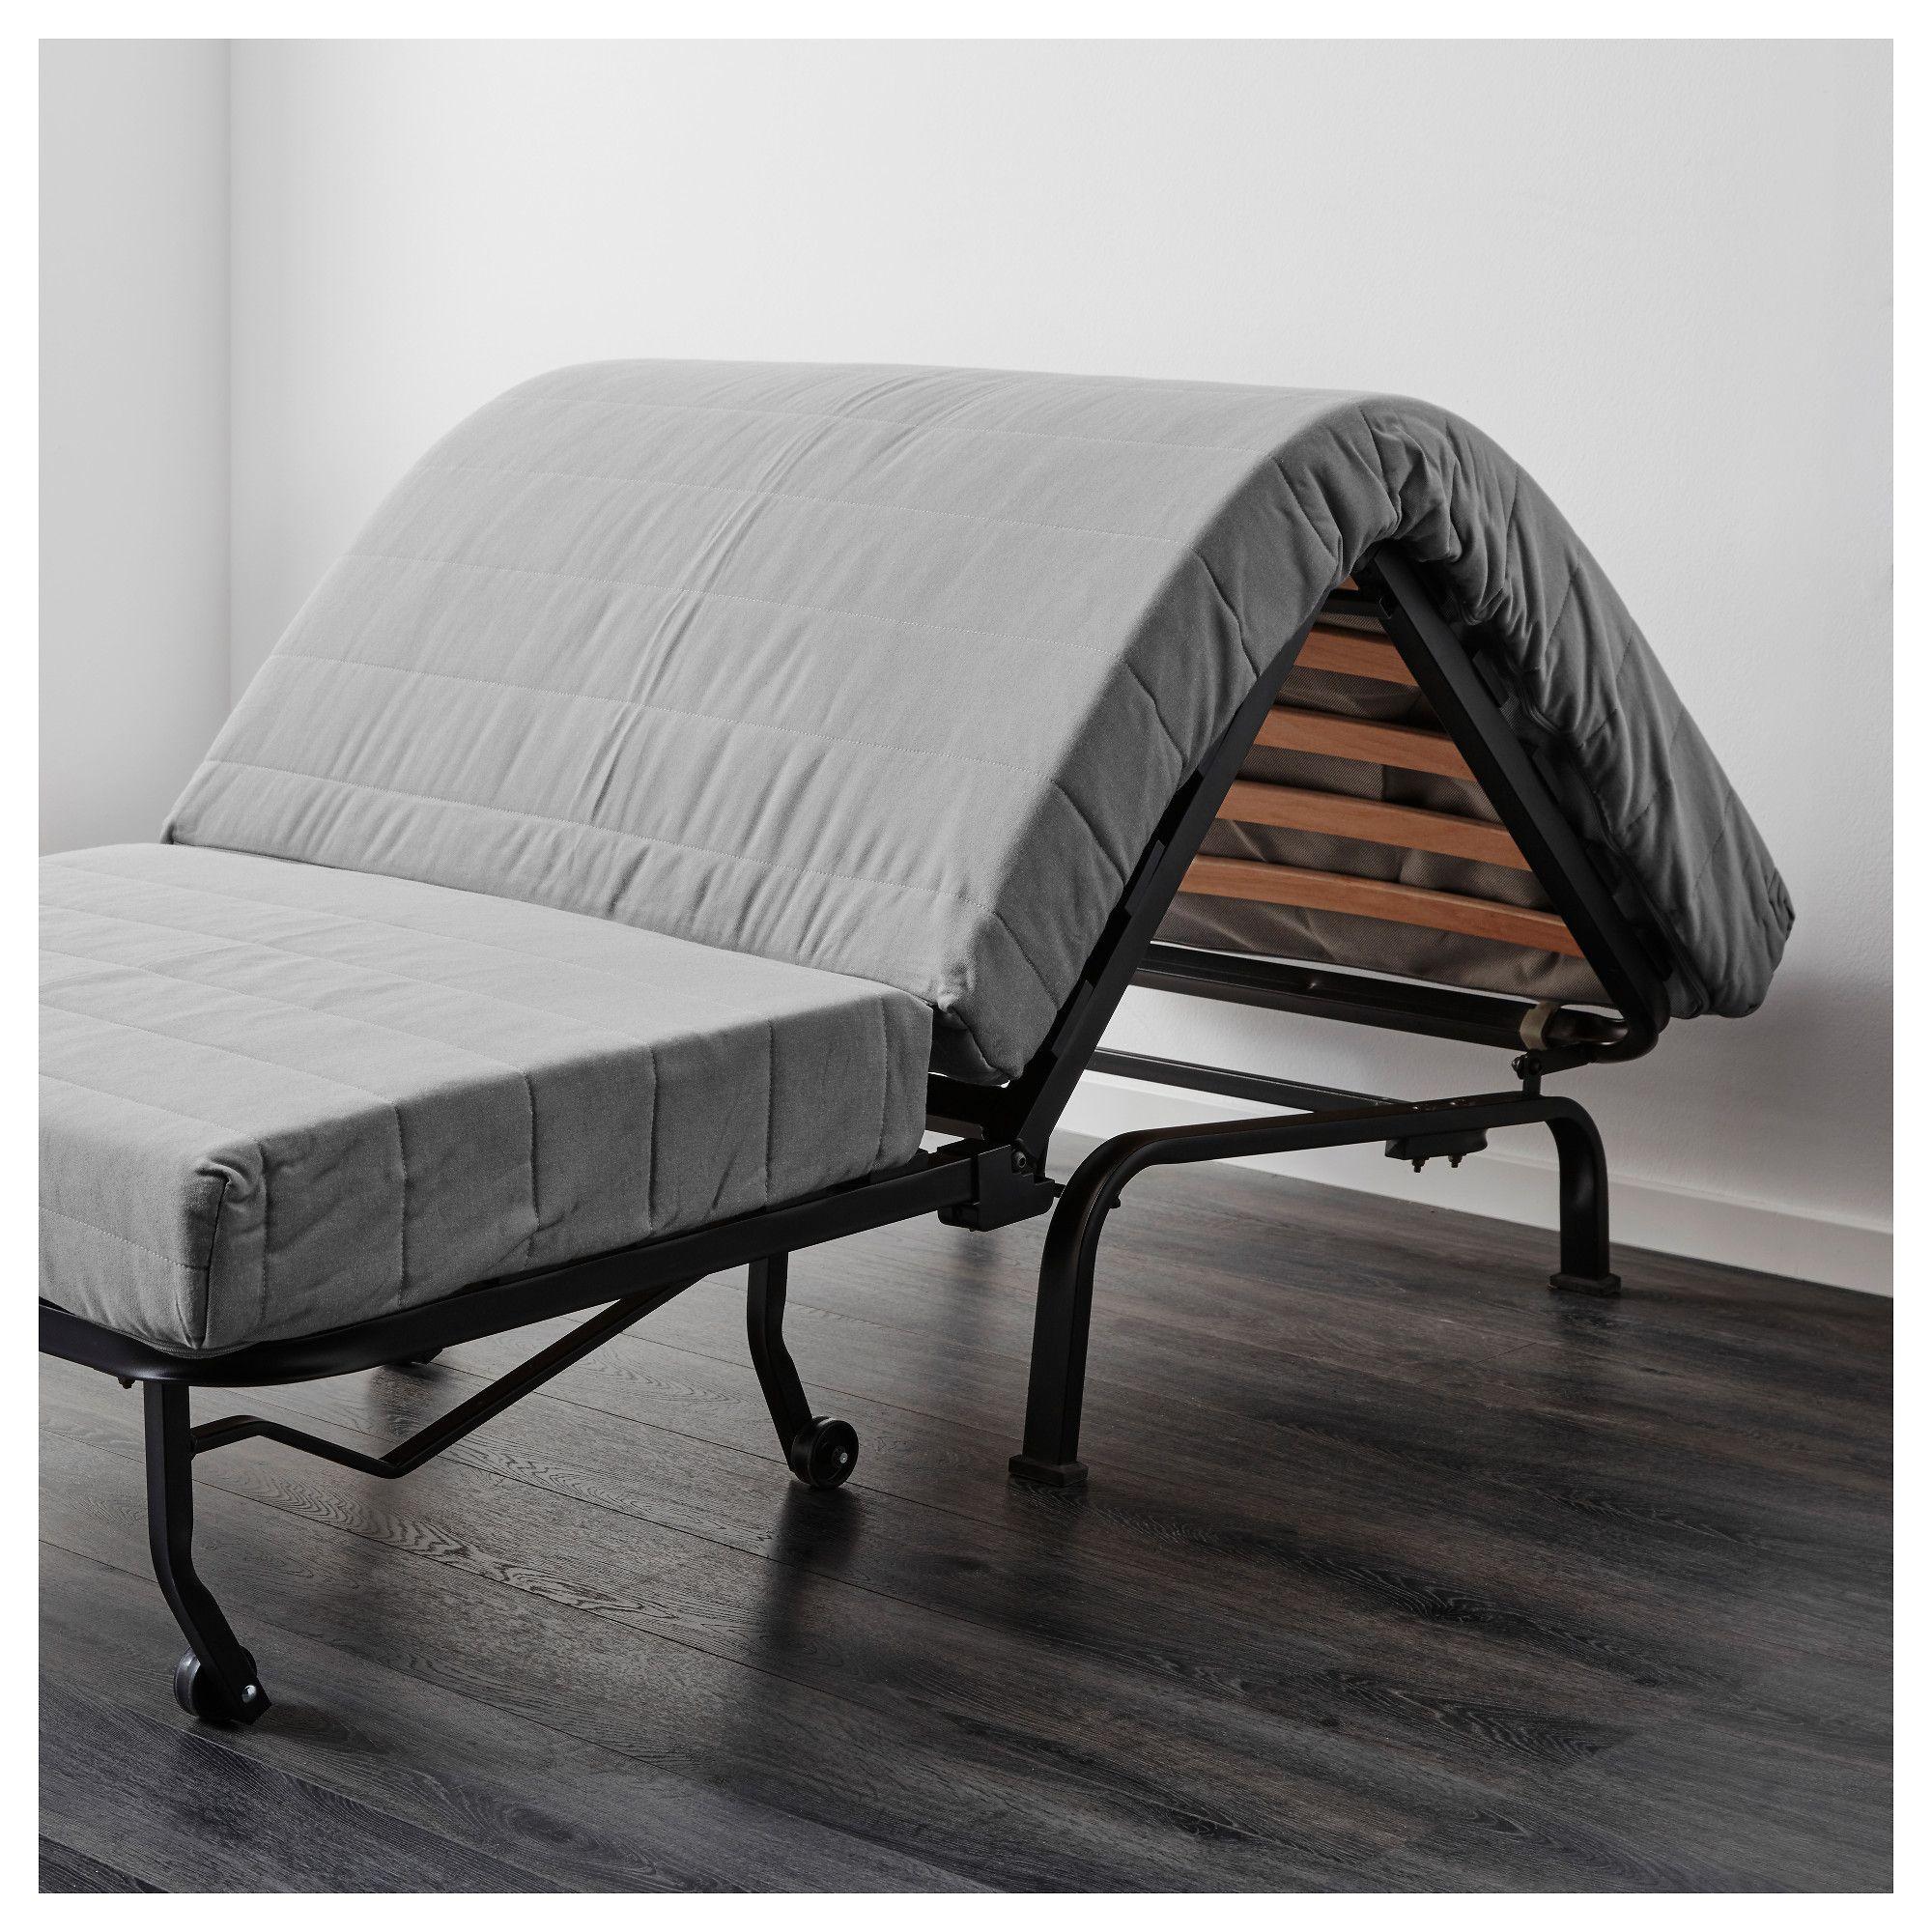 Lycksele H 197 Vet Chair Bed Vallarum Grey Ikea Ikea Sofa